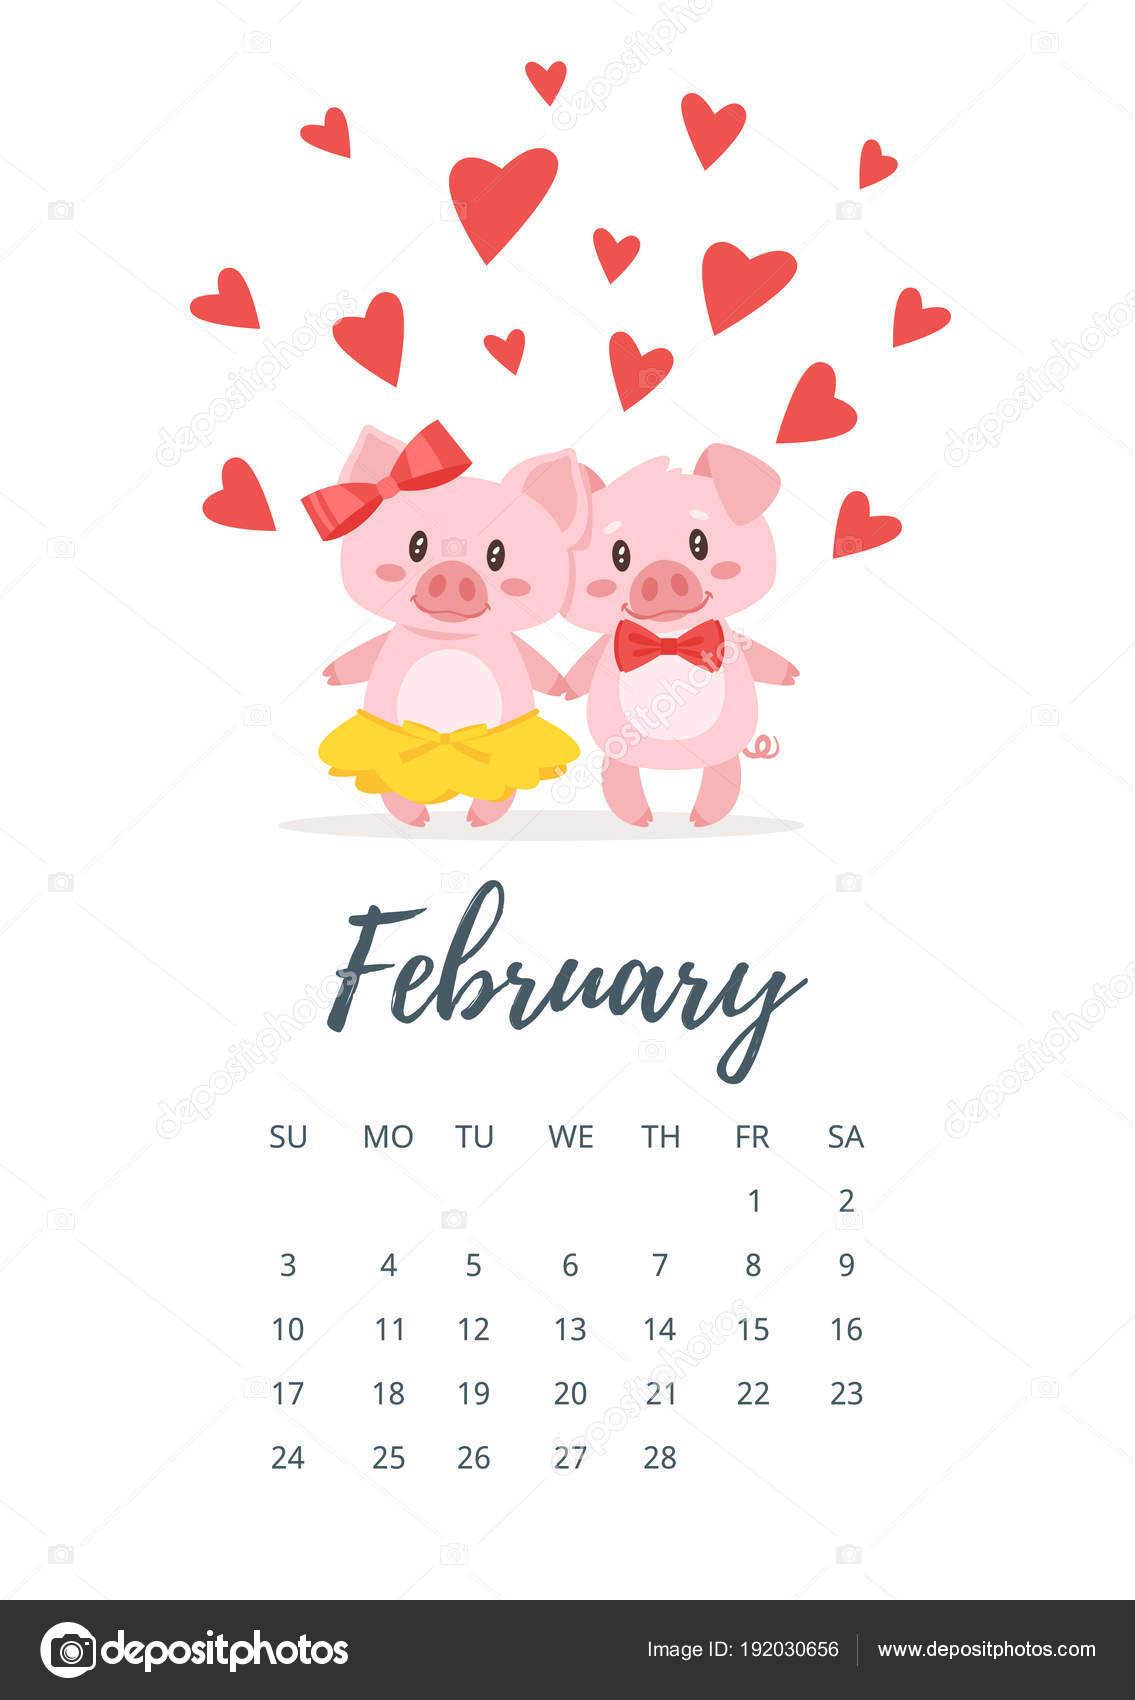 naptár 2019 február Évben 2019 február naptár oldal — Stock Vektor © tkronalter9.gmail  naptár 2019 február